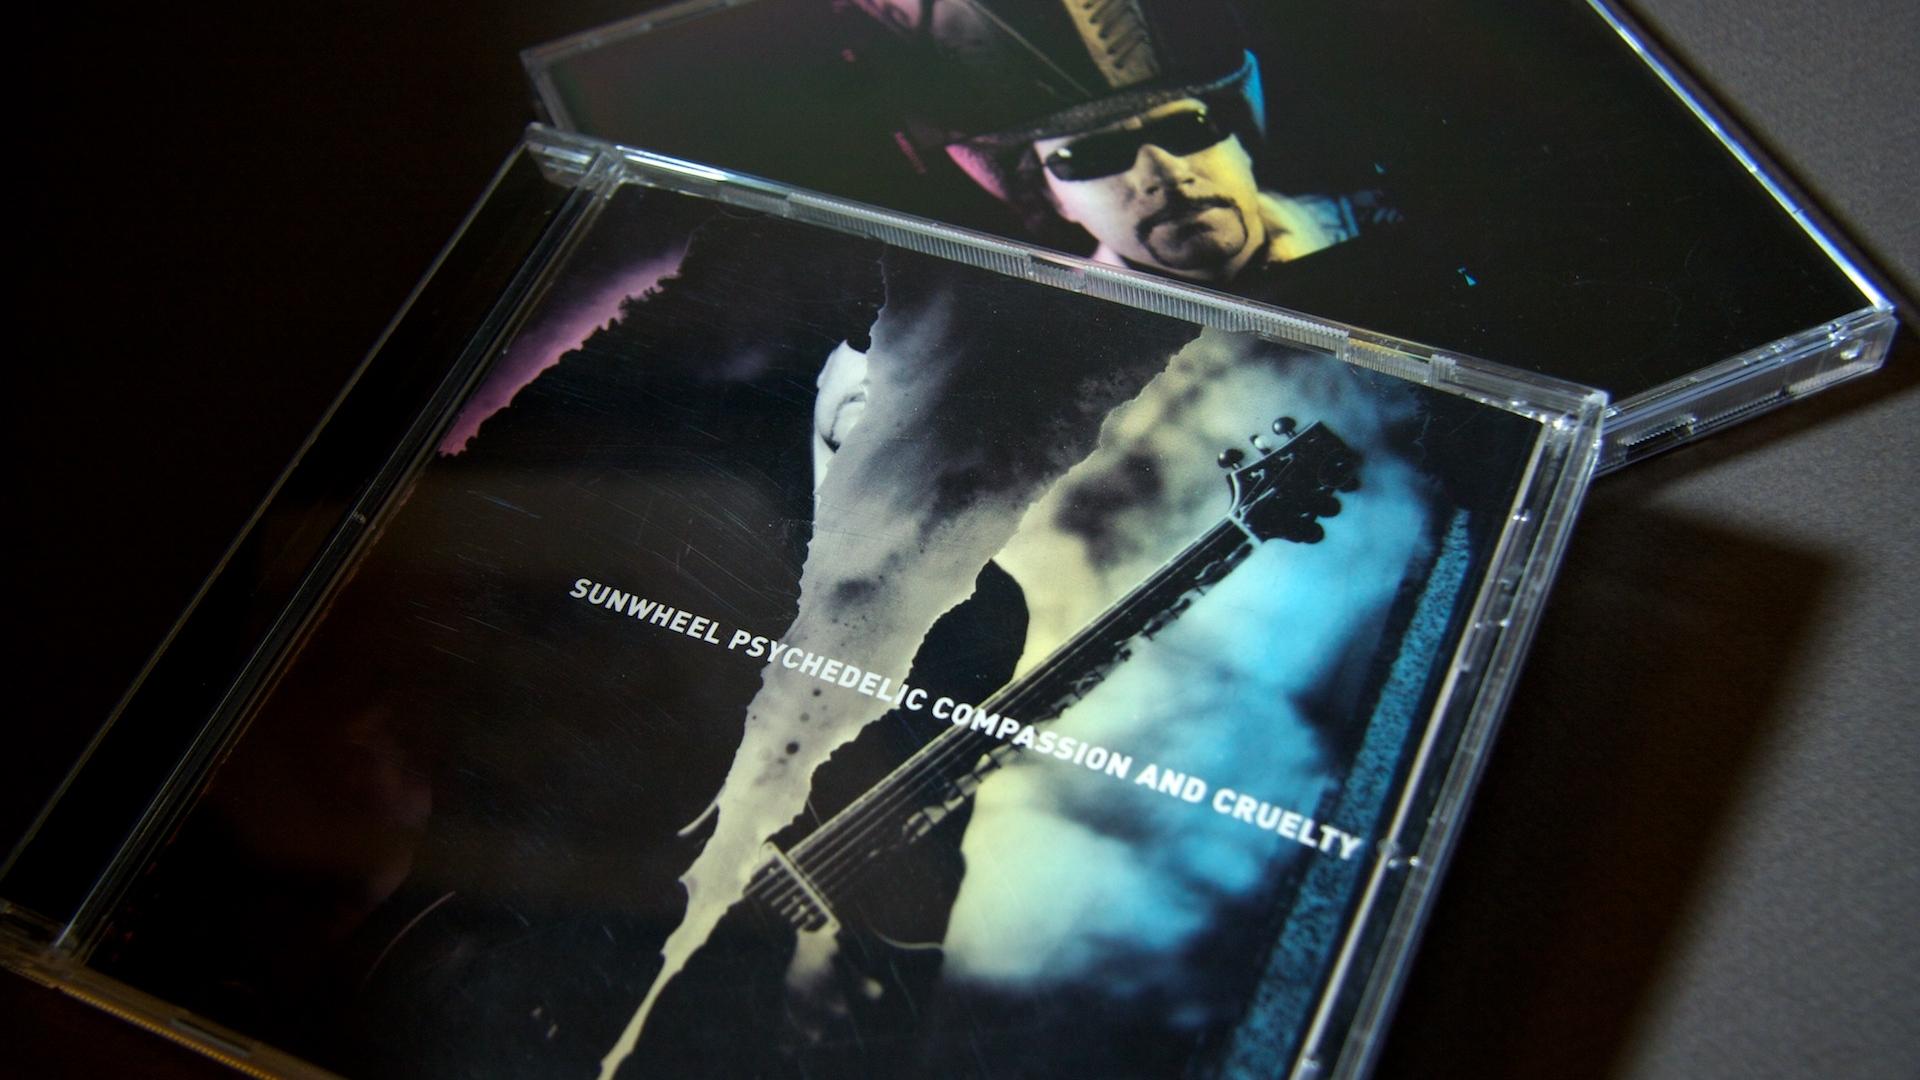 Sunwheel Psychedelic Album Packaging